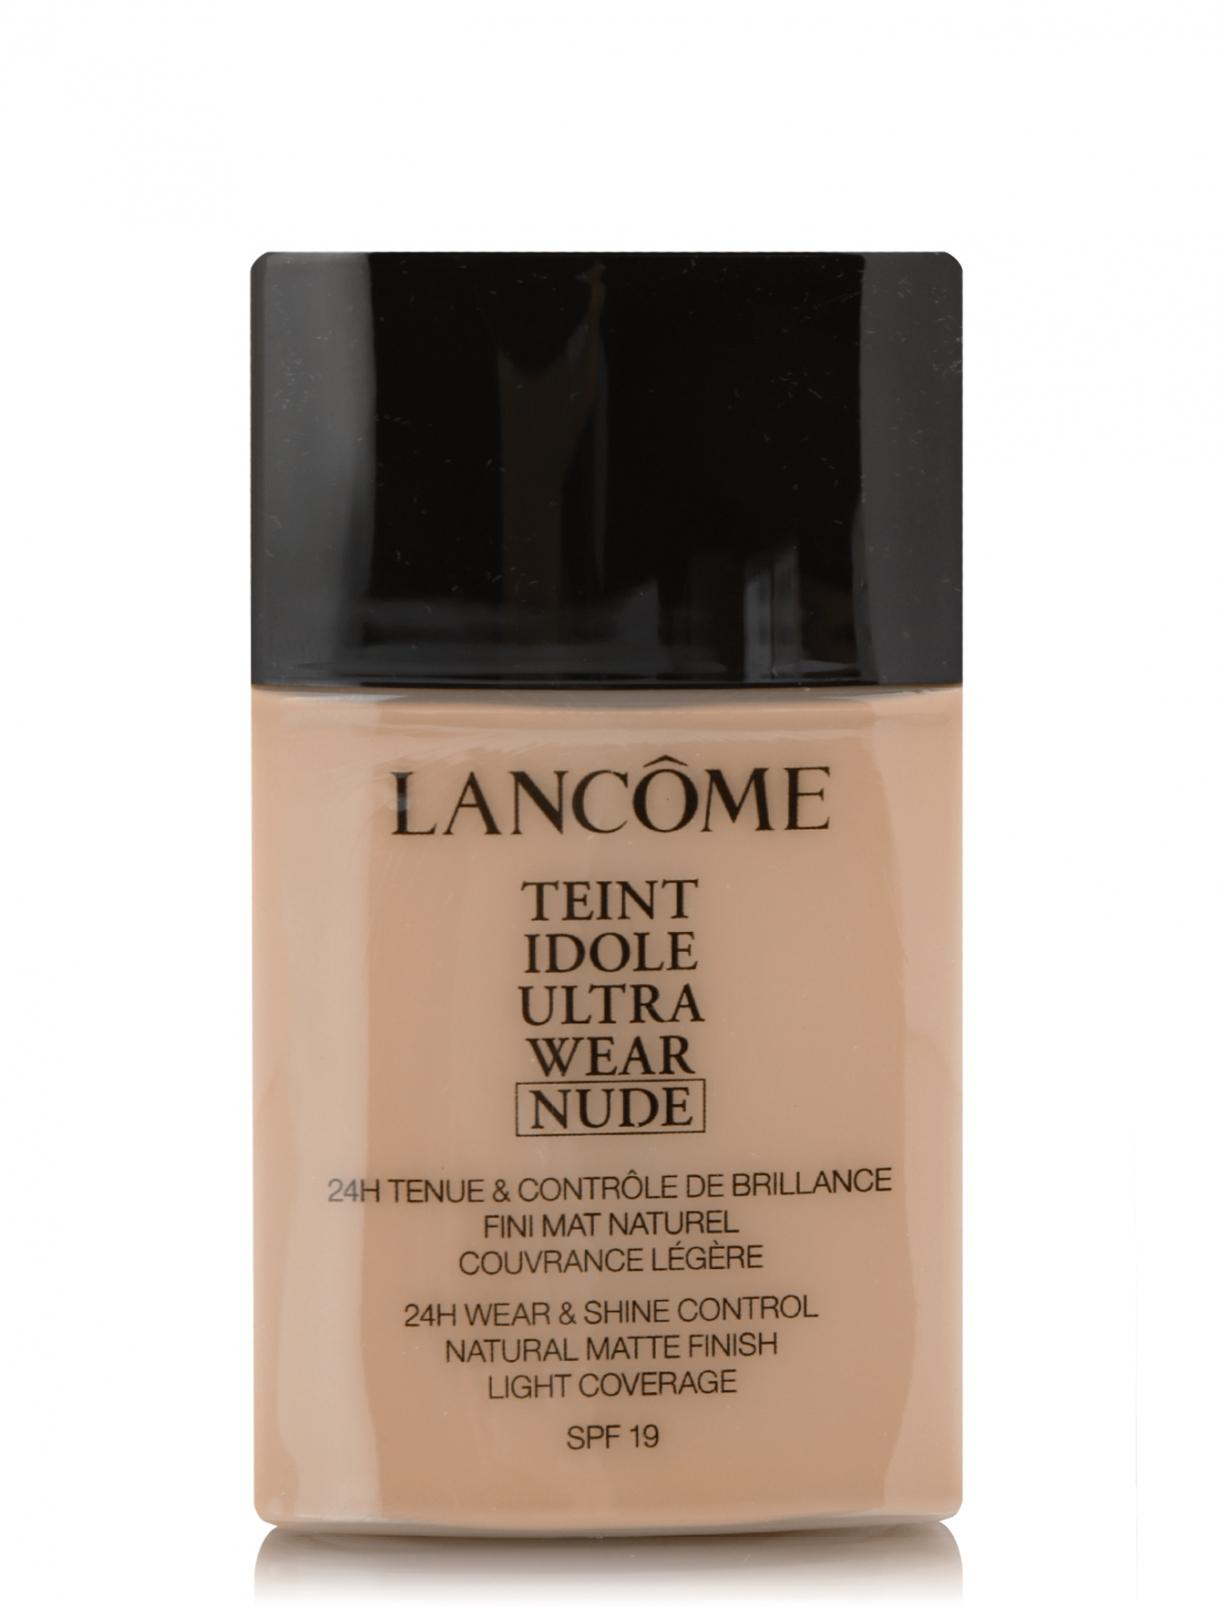 Тональный флюид 05 Teint Idole Ultra Wear Nude Lancome  –  Общий вид